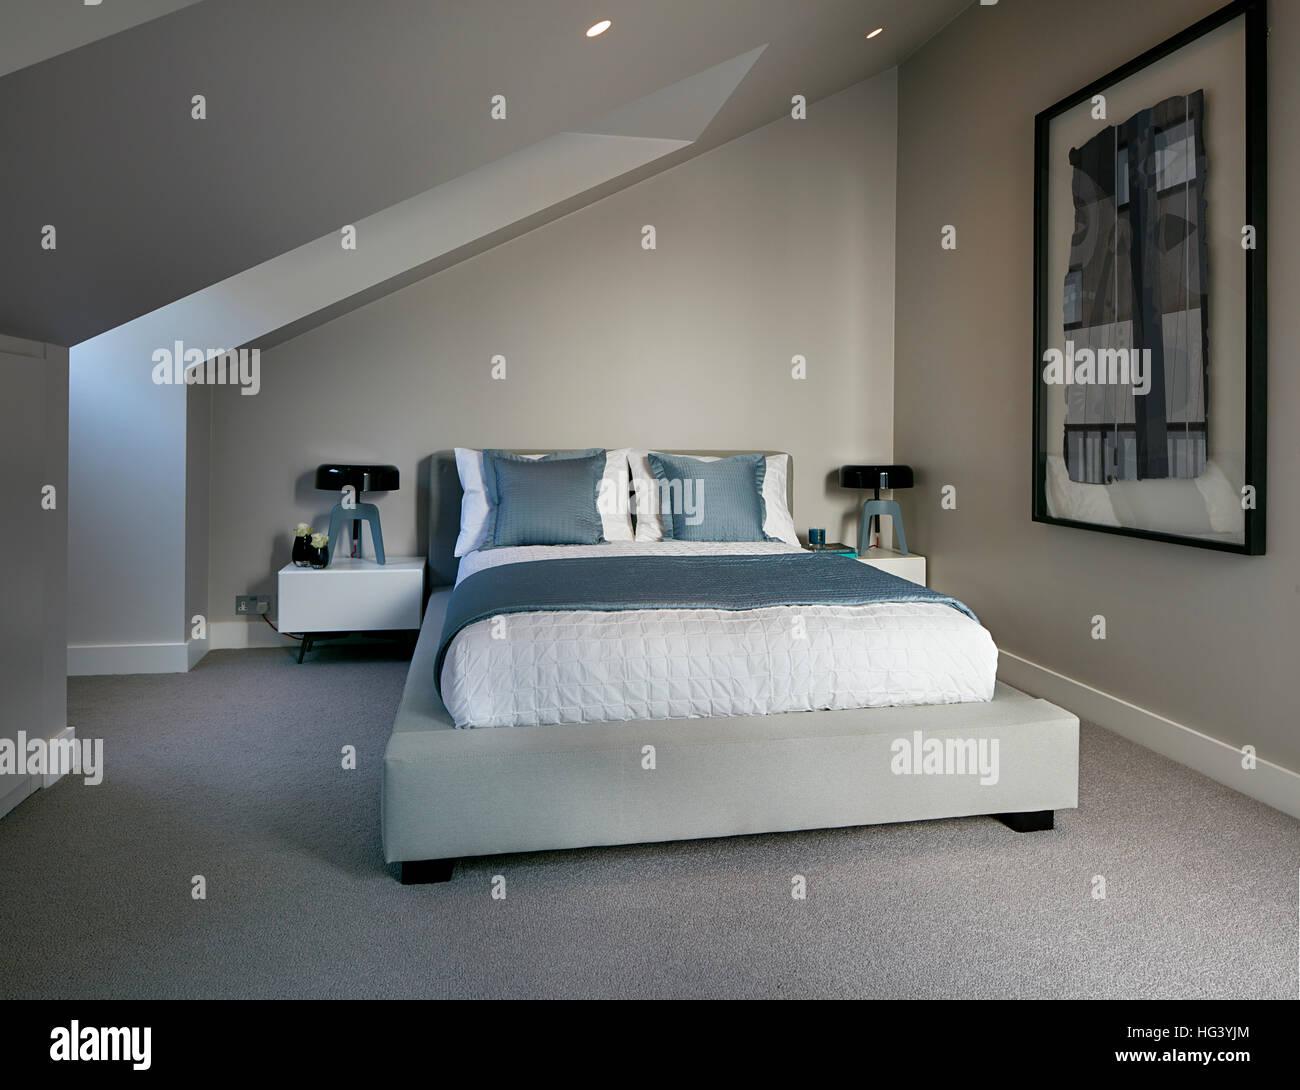 3 Bedroom Apartment Plan 3d Retro Bedroom Furniture Bedroom Interior Color Design Modern Bedroom Lighting Design: Interior Contemporary Bedroom Design Art Stock Photos